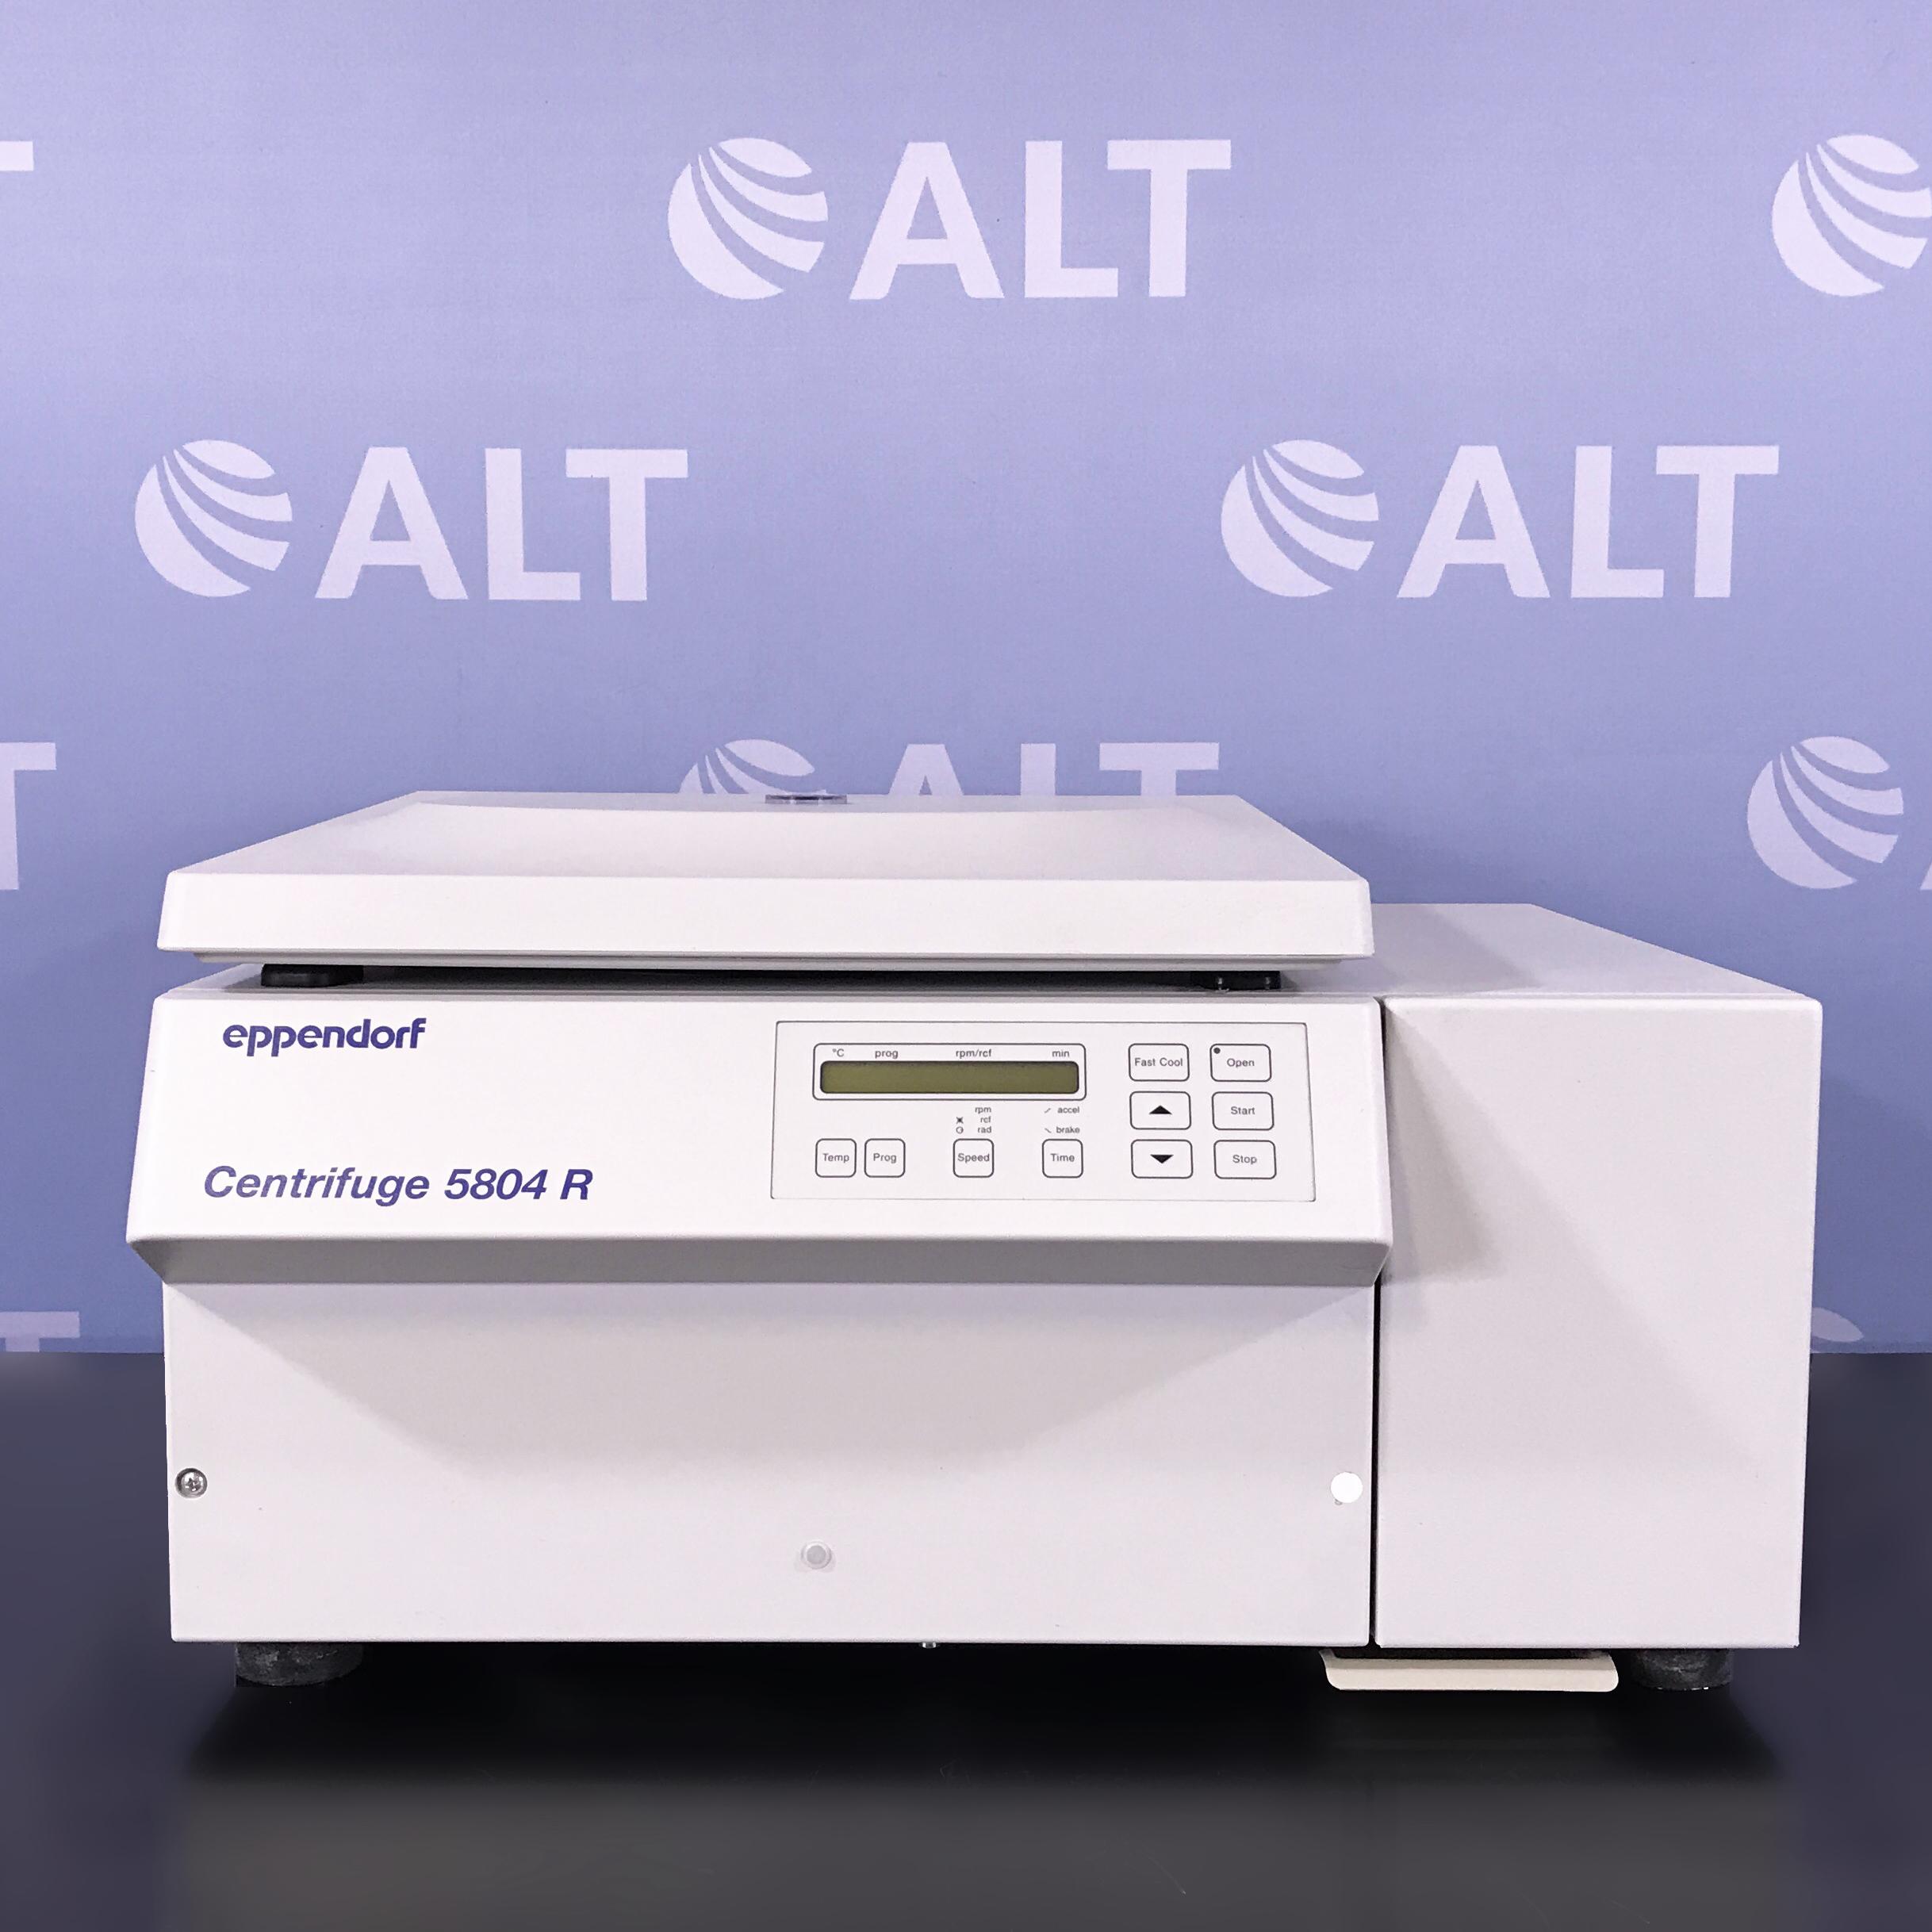 Eppendorf 5804R Refrigerated Centrifuge Image